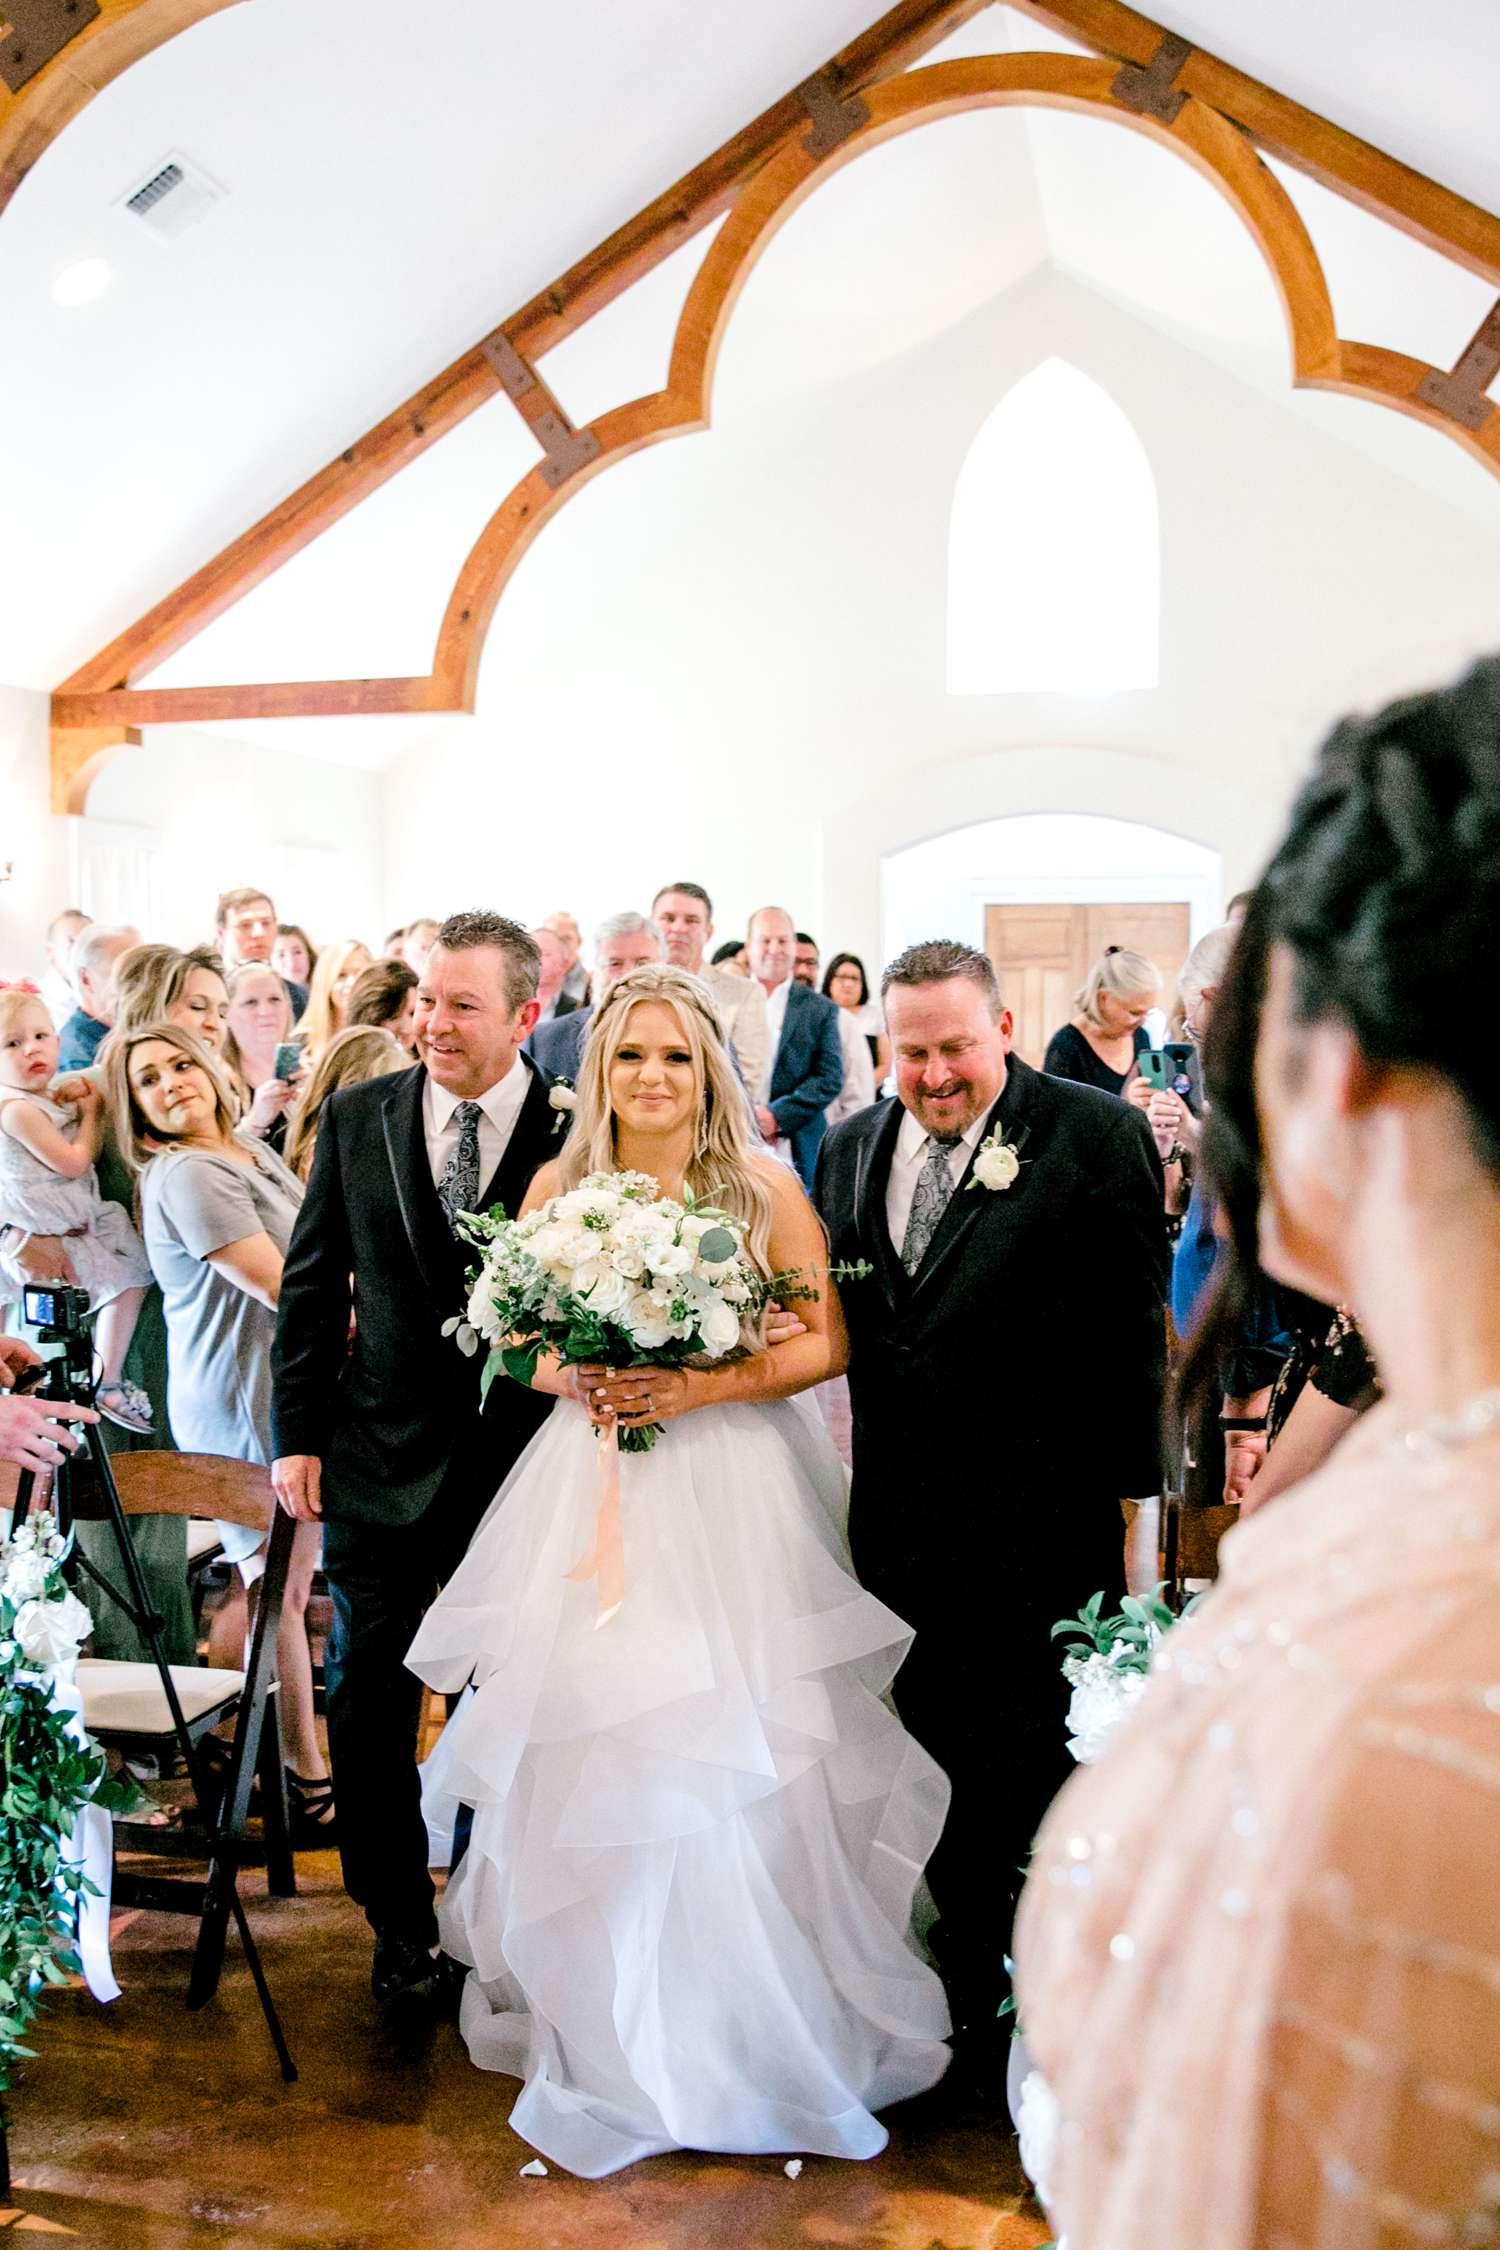 HAYLEE+JUSTIN+GREGORY+HERITAGE_HAUS_AUSTIN_TEXAS_WEDDING_0070.jpg